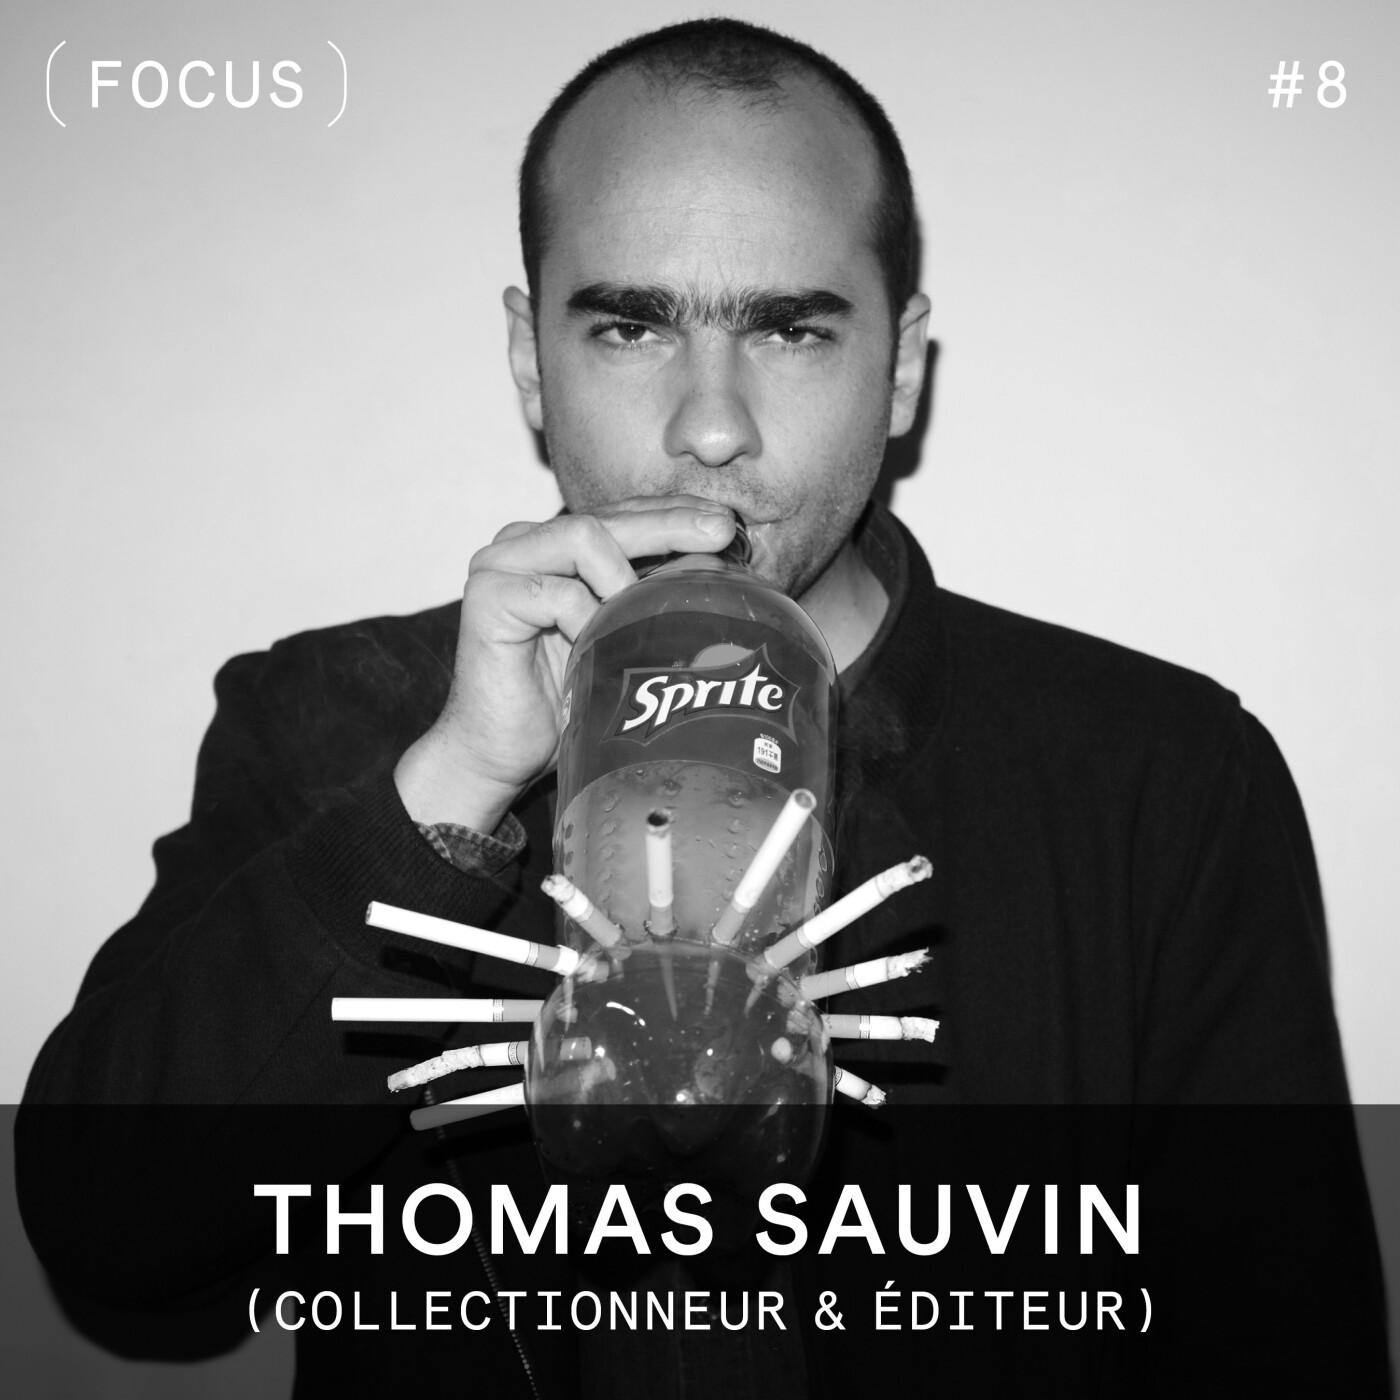 FOCUS #8 - Thomas Sauvin (Beijing Silvermine)